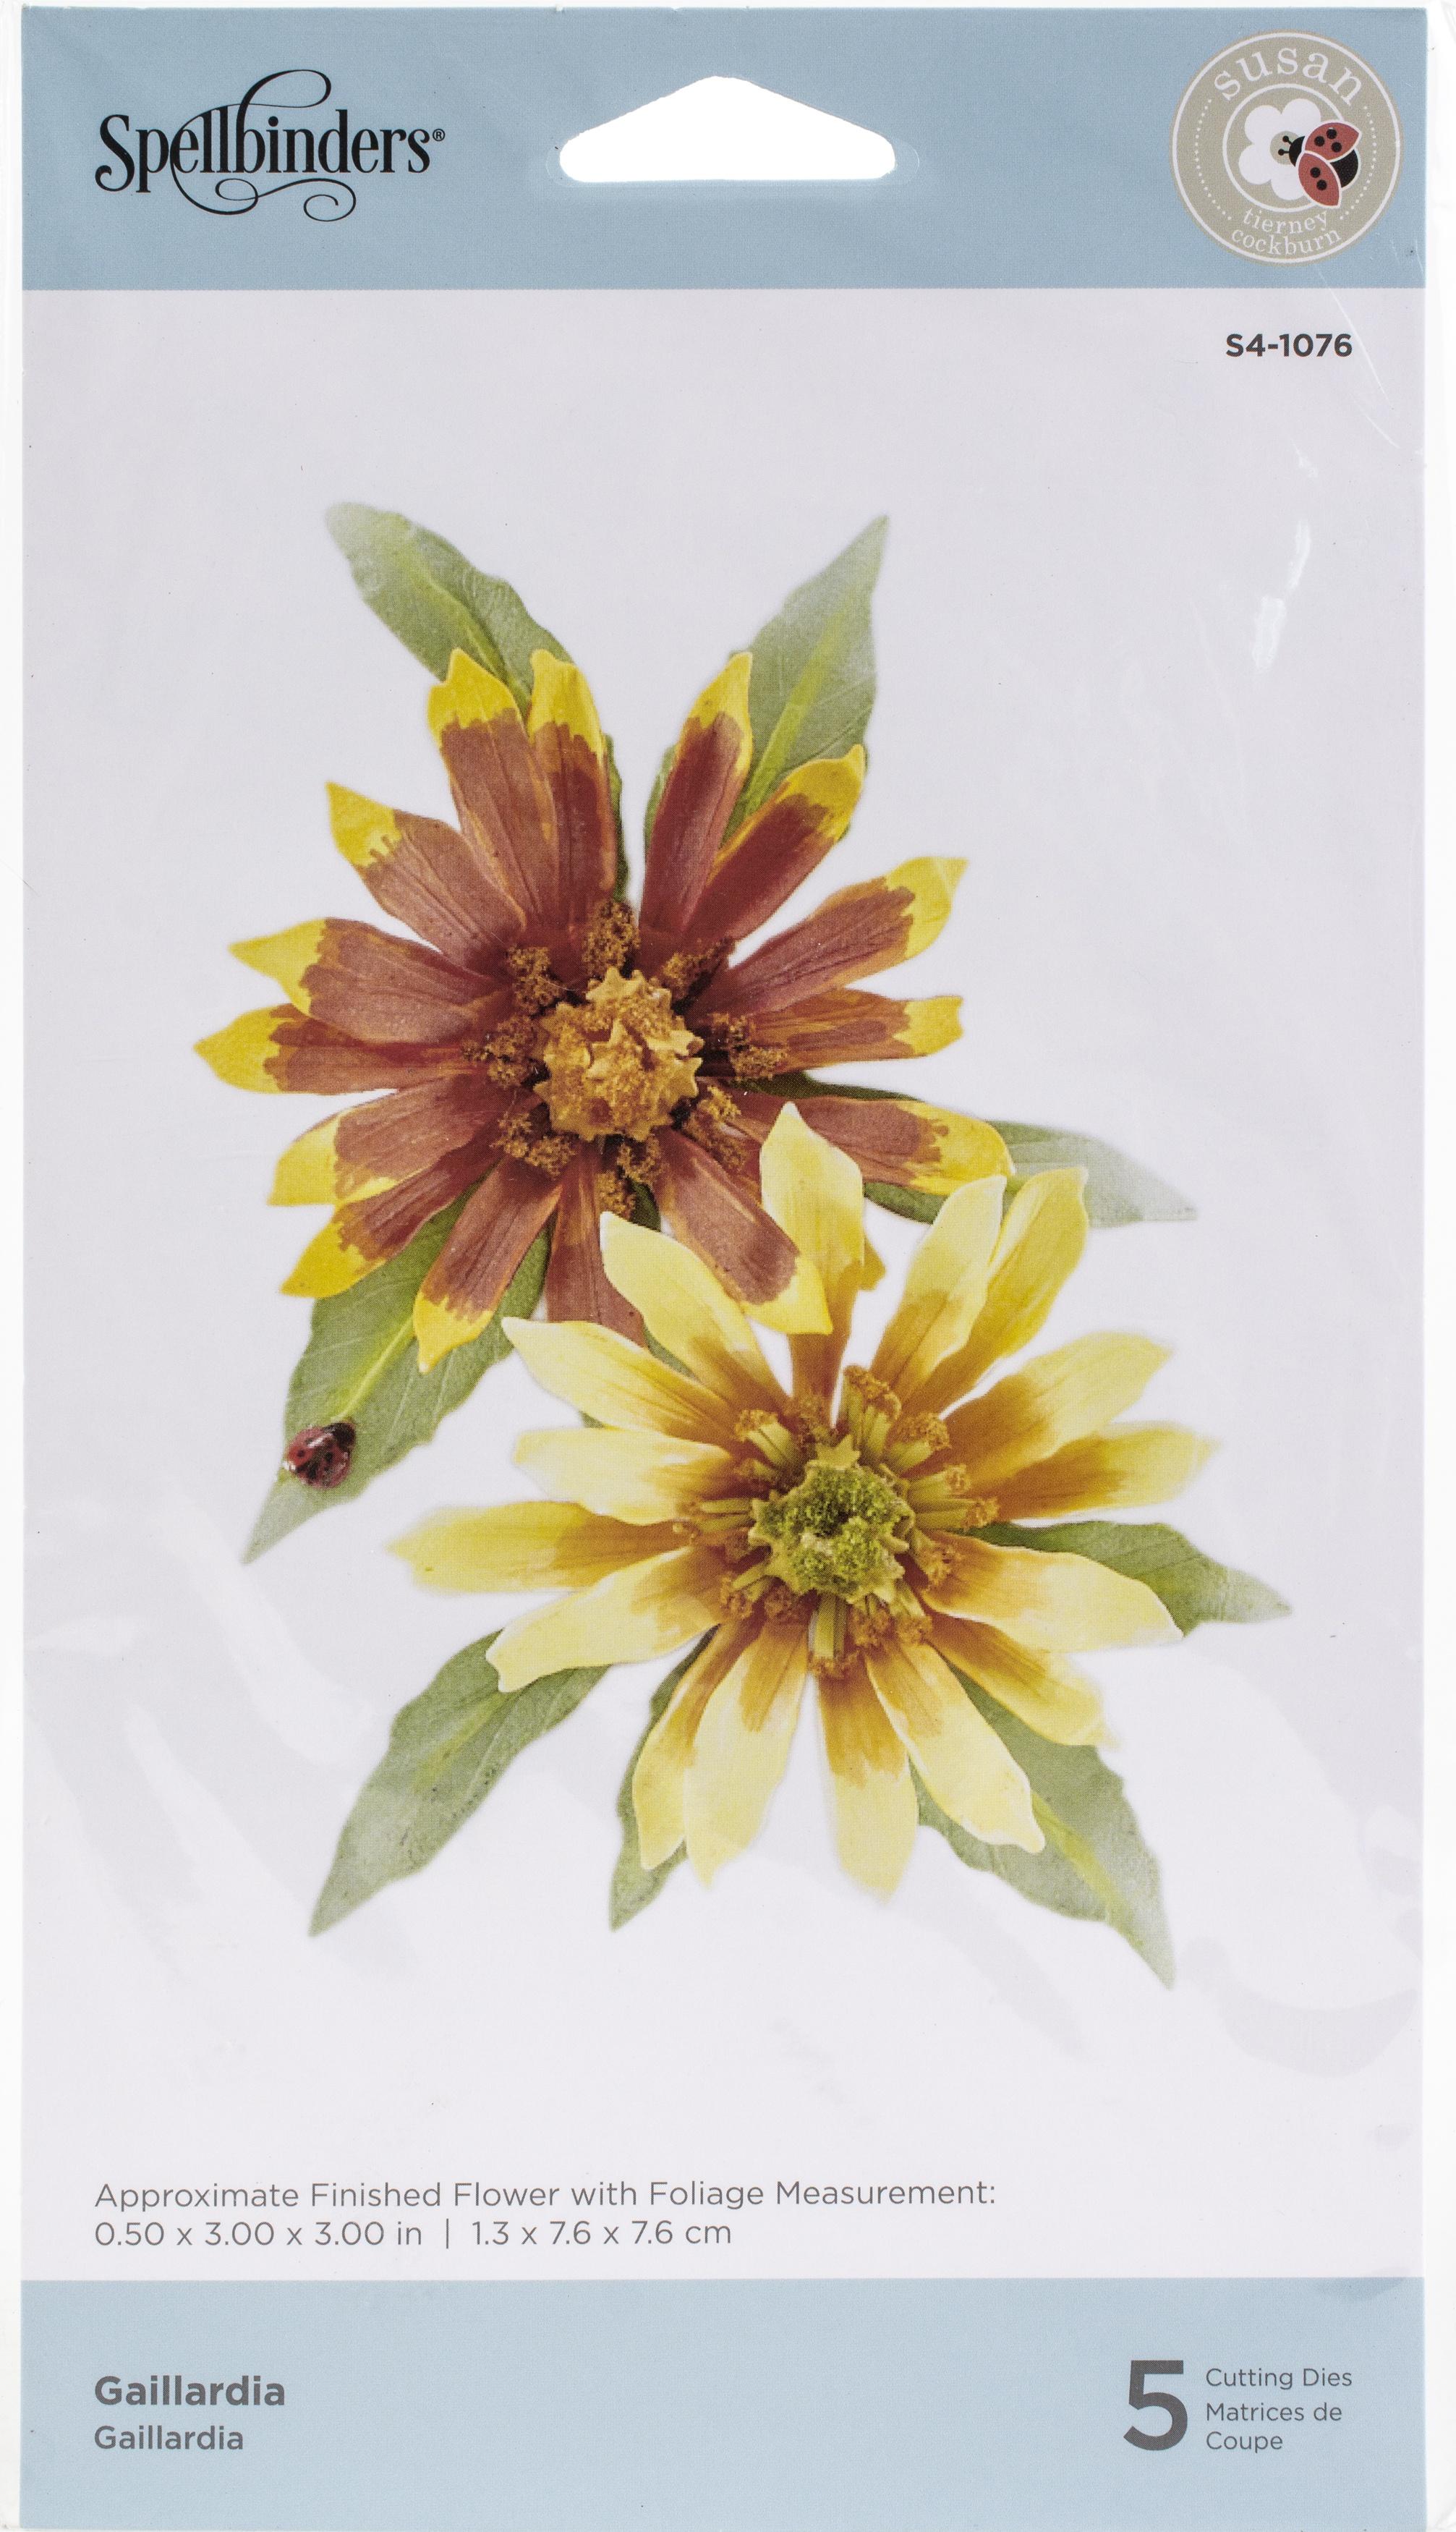 Spellbinders Etched Dies By Susan Tierney-Cockburn-Gaillardia- Susan's Autumn Fl...